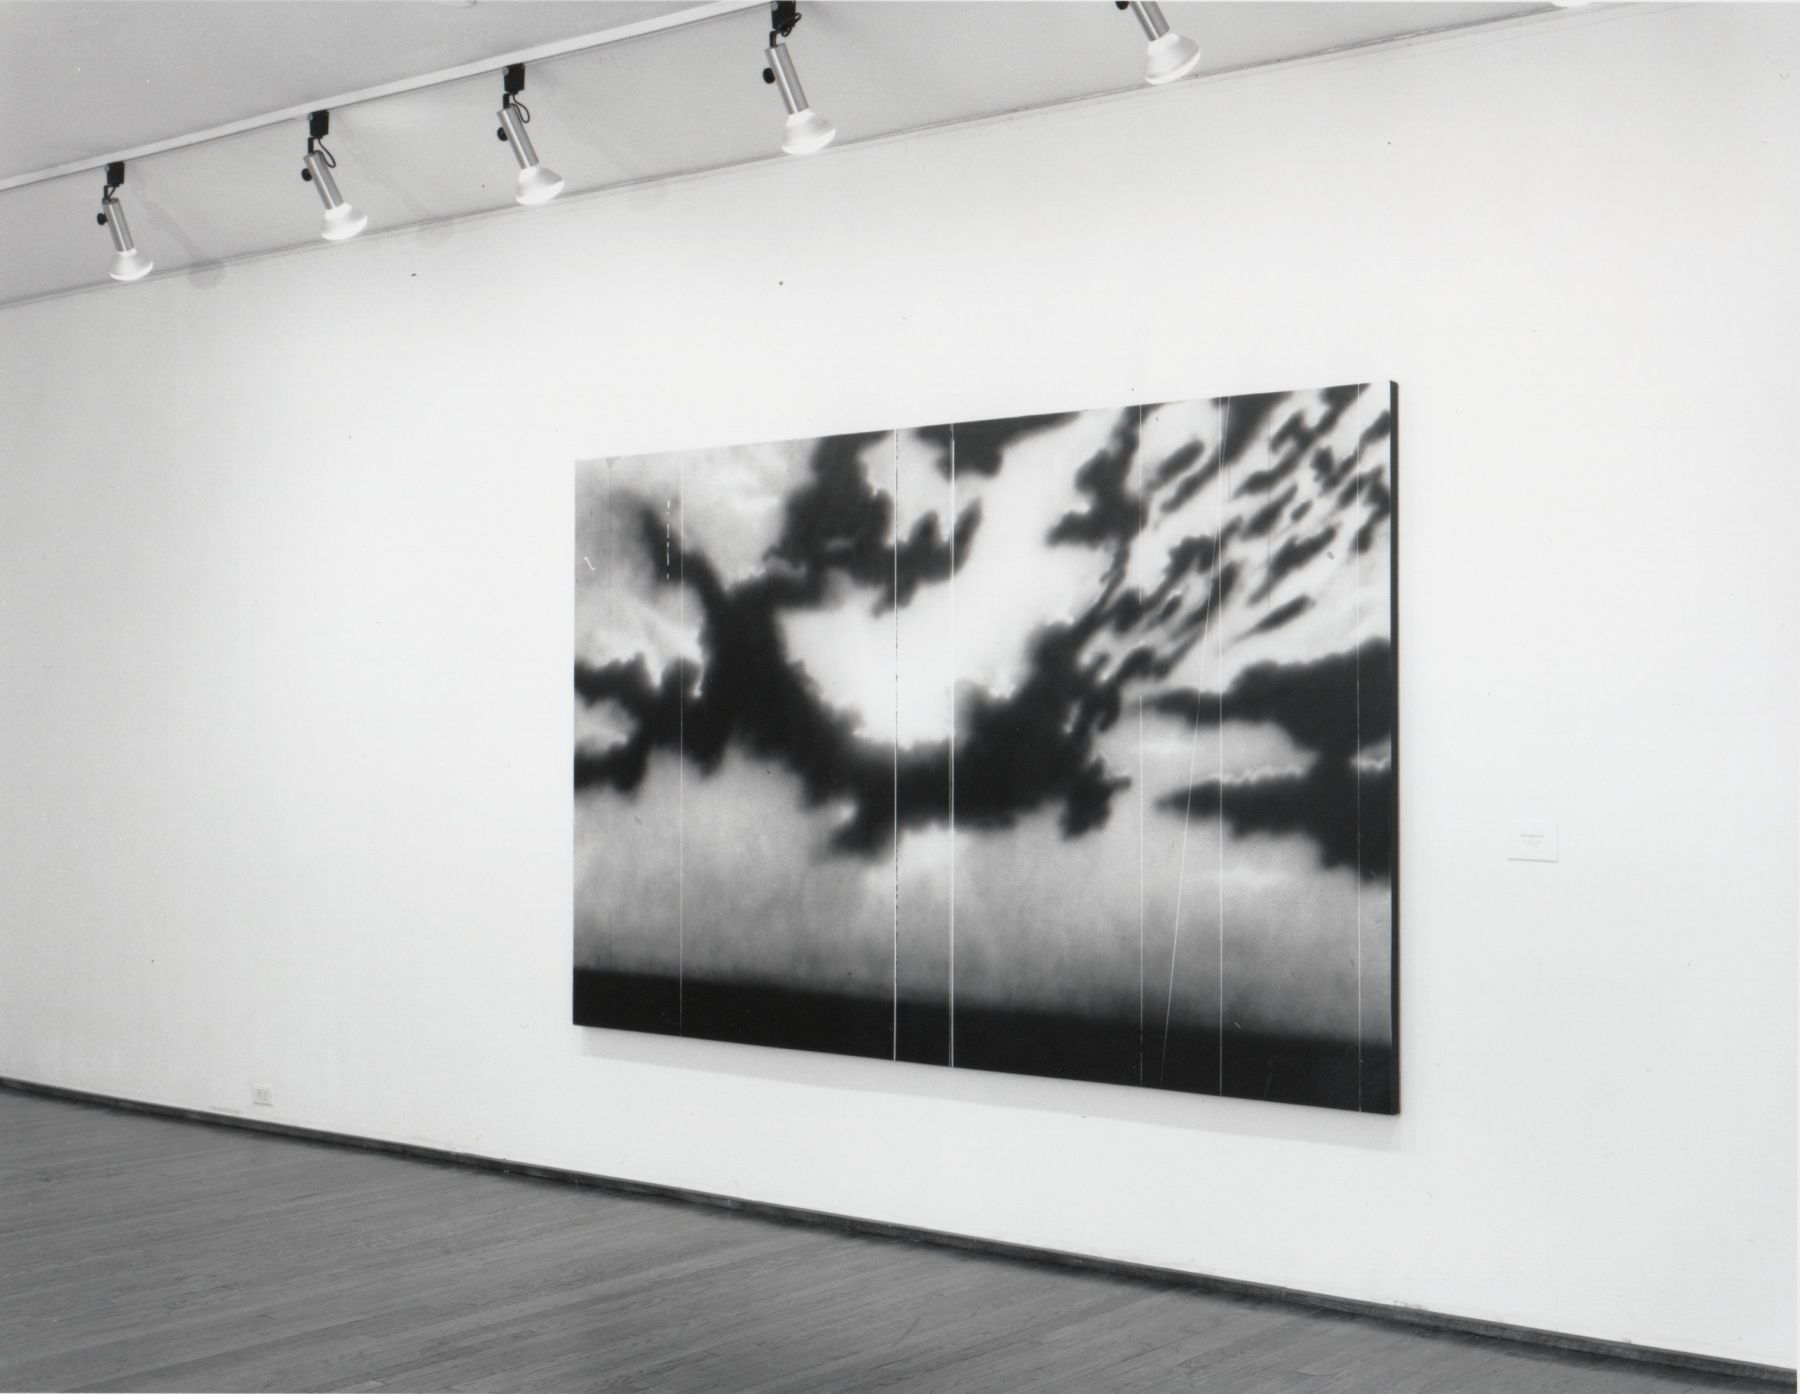 Installation view, Ed Ruscha, 420 WEST BROADWAY.